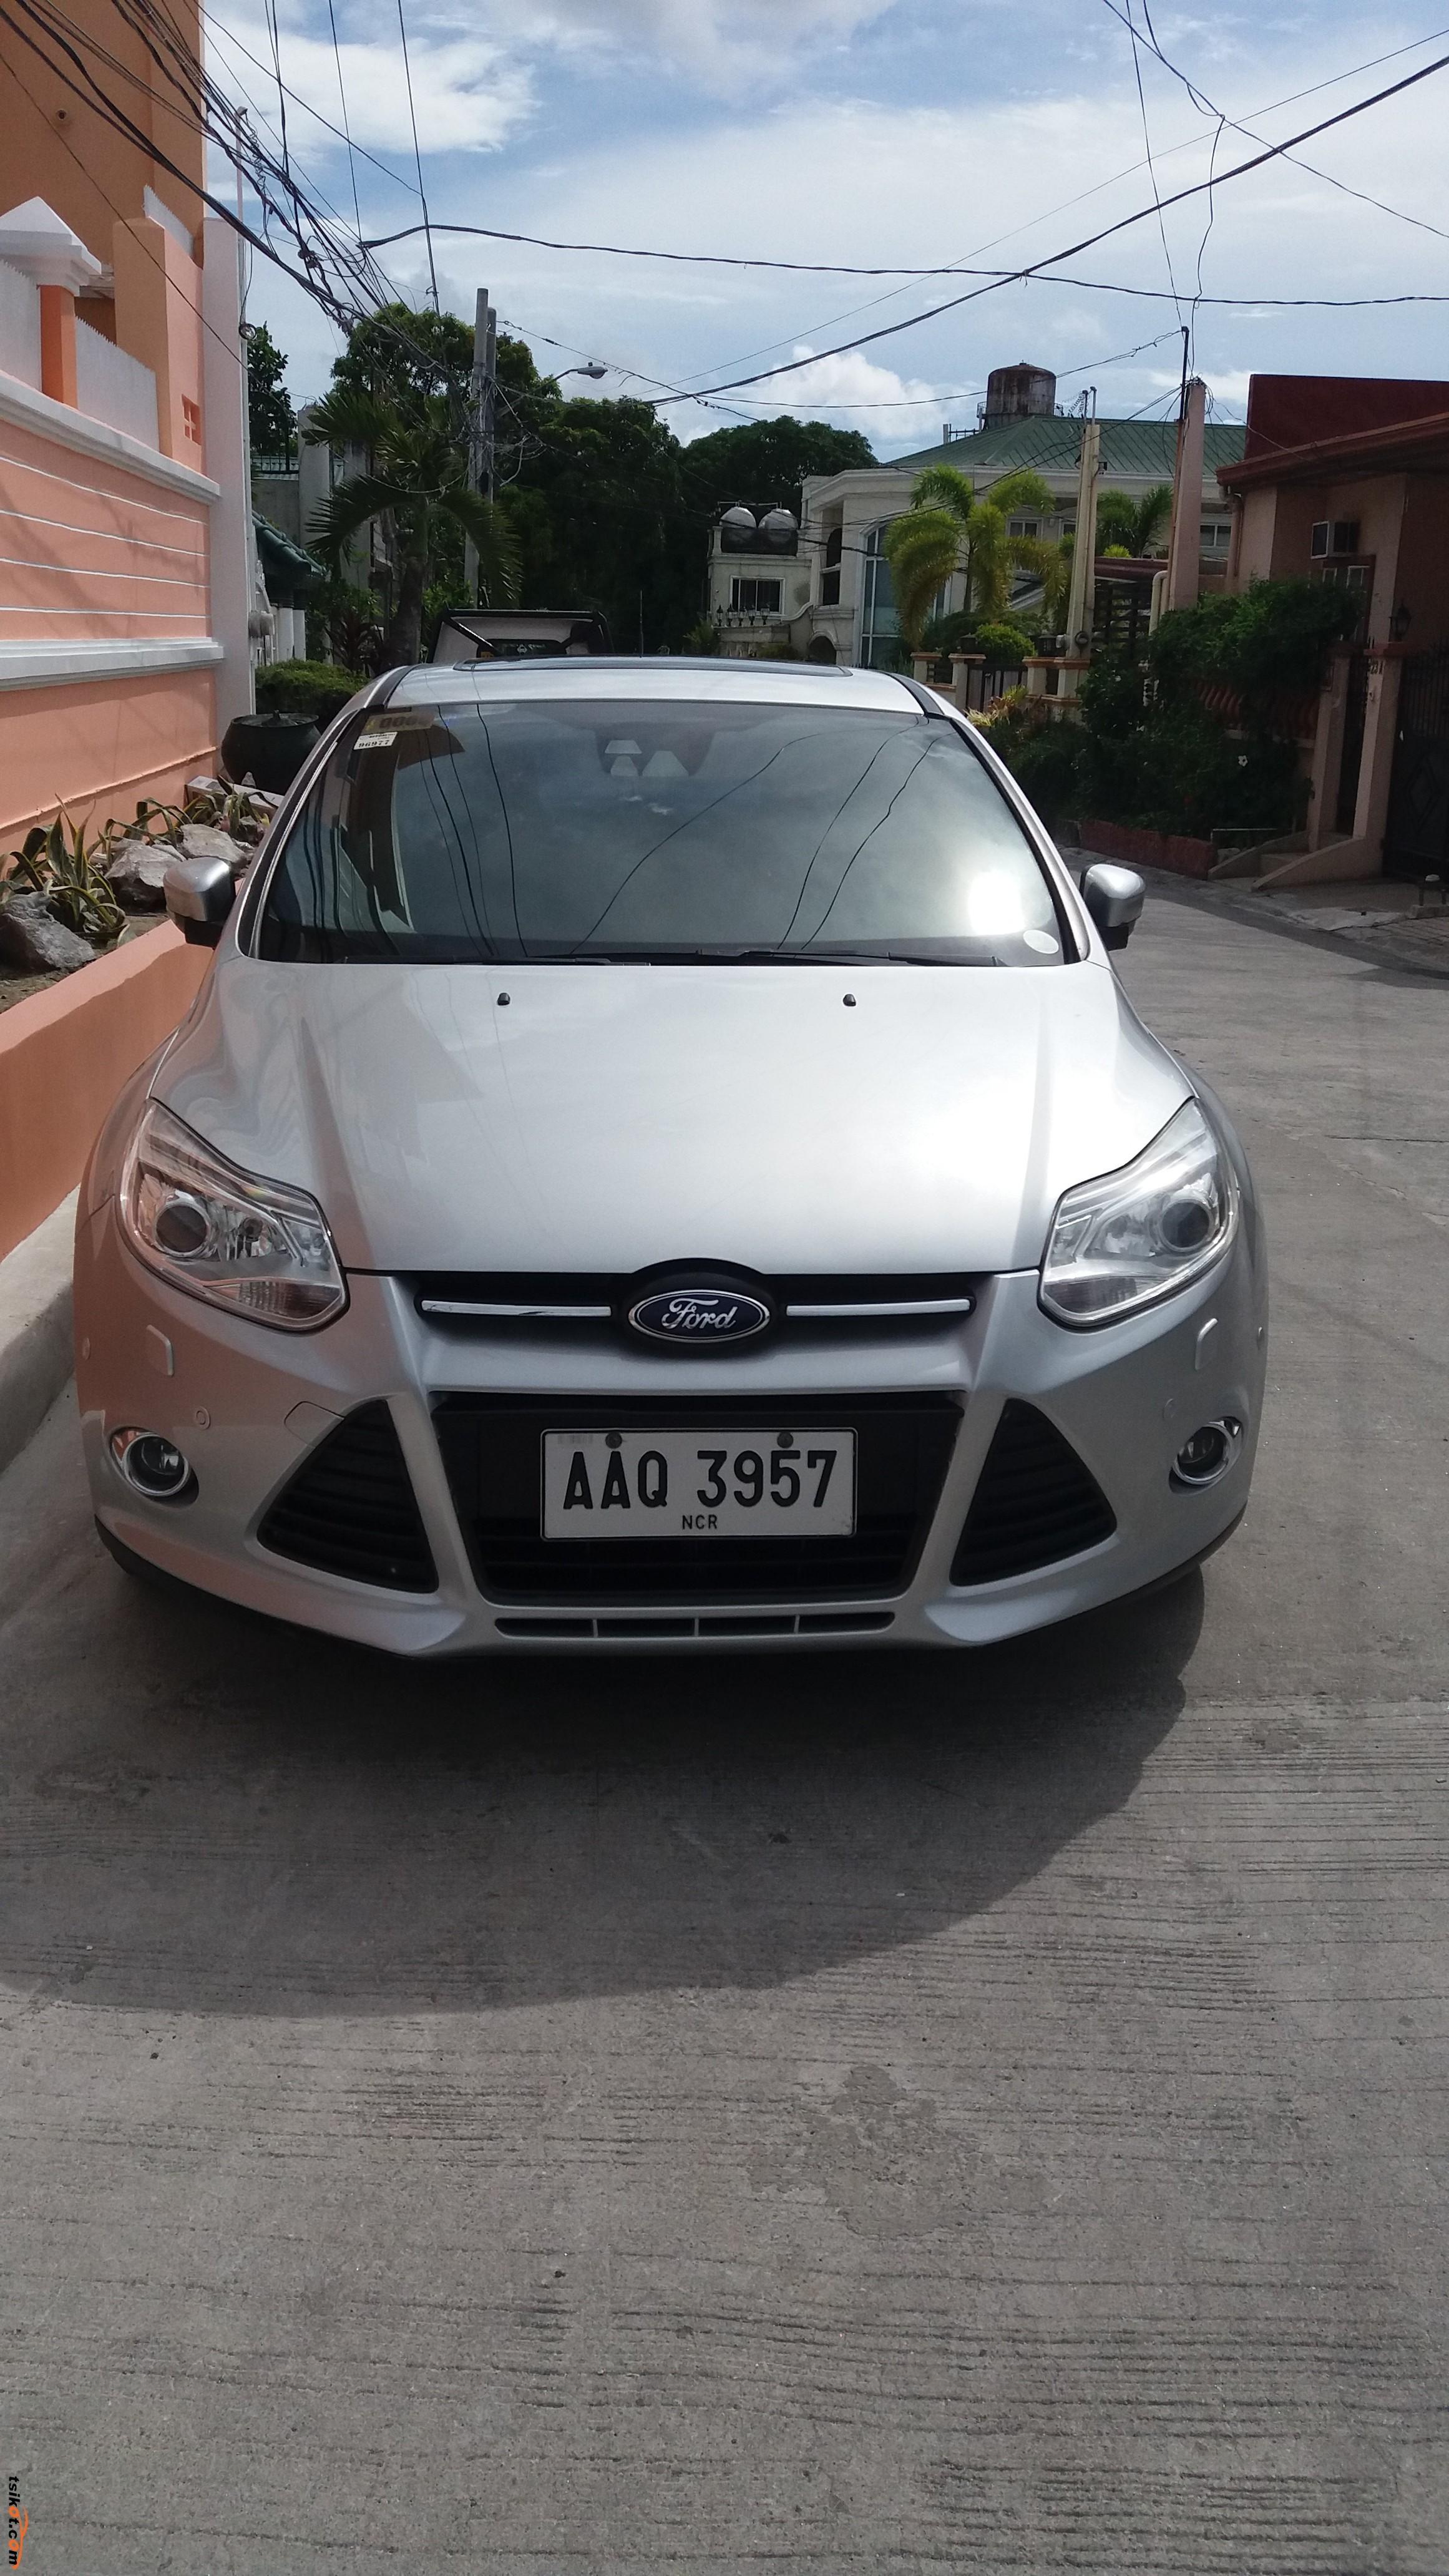 Ford Focus 2014 - 1